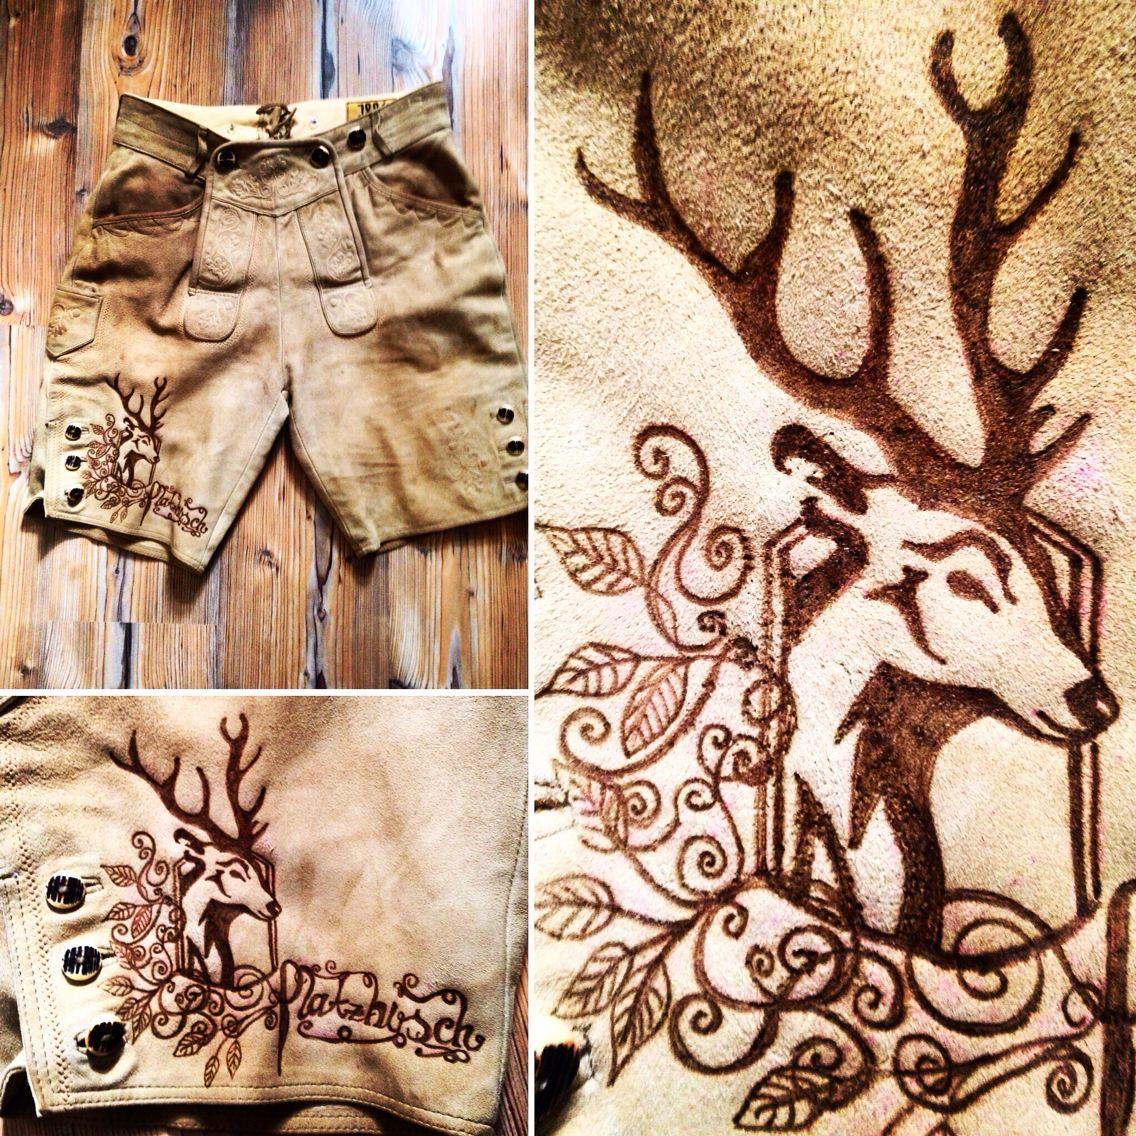 Wer sein Revier markieren will, der bekommt das Richtige bei www.maindirndl.com ! #lederhose #lederhosn #leder #leather #branding #design #maindirndl #trachten #tradition #bayern #bavaria #wiesn #wiesn2015 #handmade #art #leatherart #hirsch #deer #potd #ootd #oktoberfest #platzhirsch